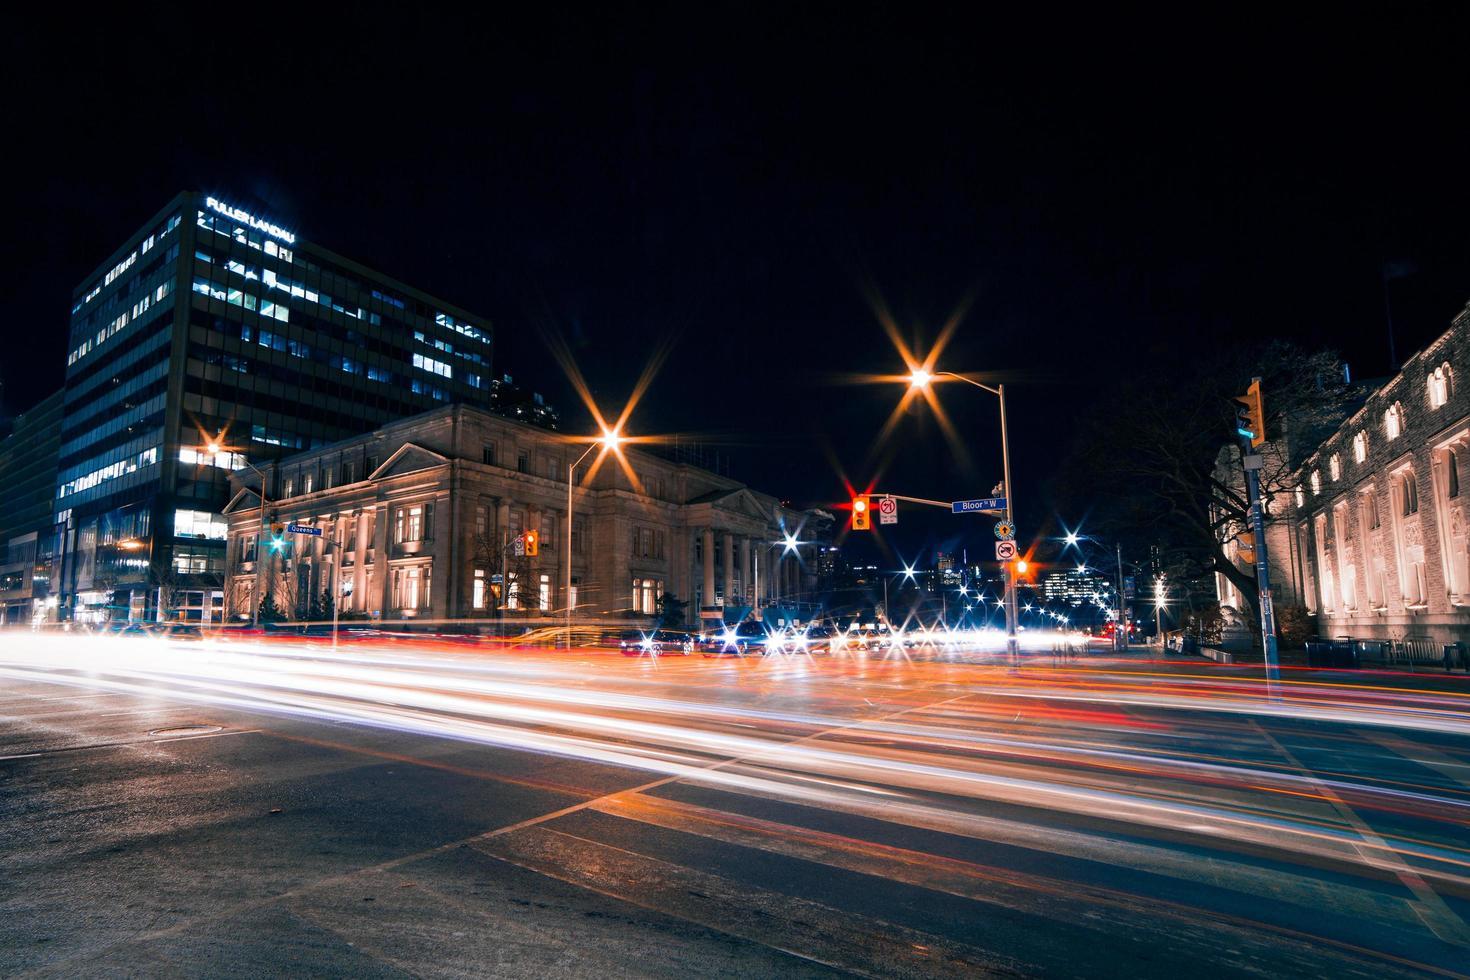 Asphalt road night view photo